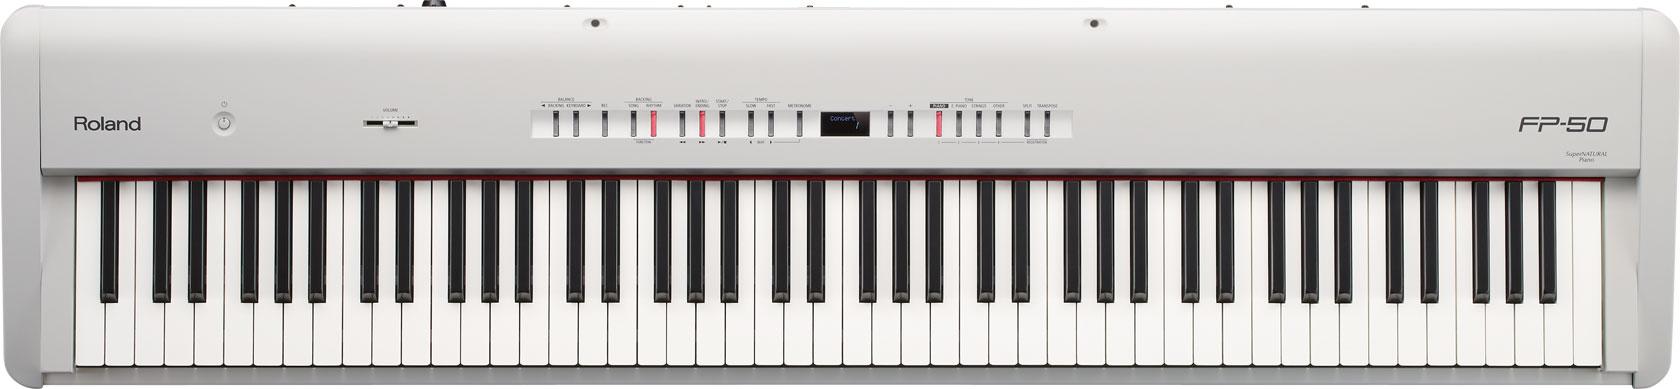 Roland FP-50 數位鋼琴 原廠一年保固